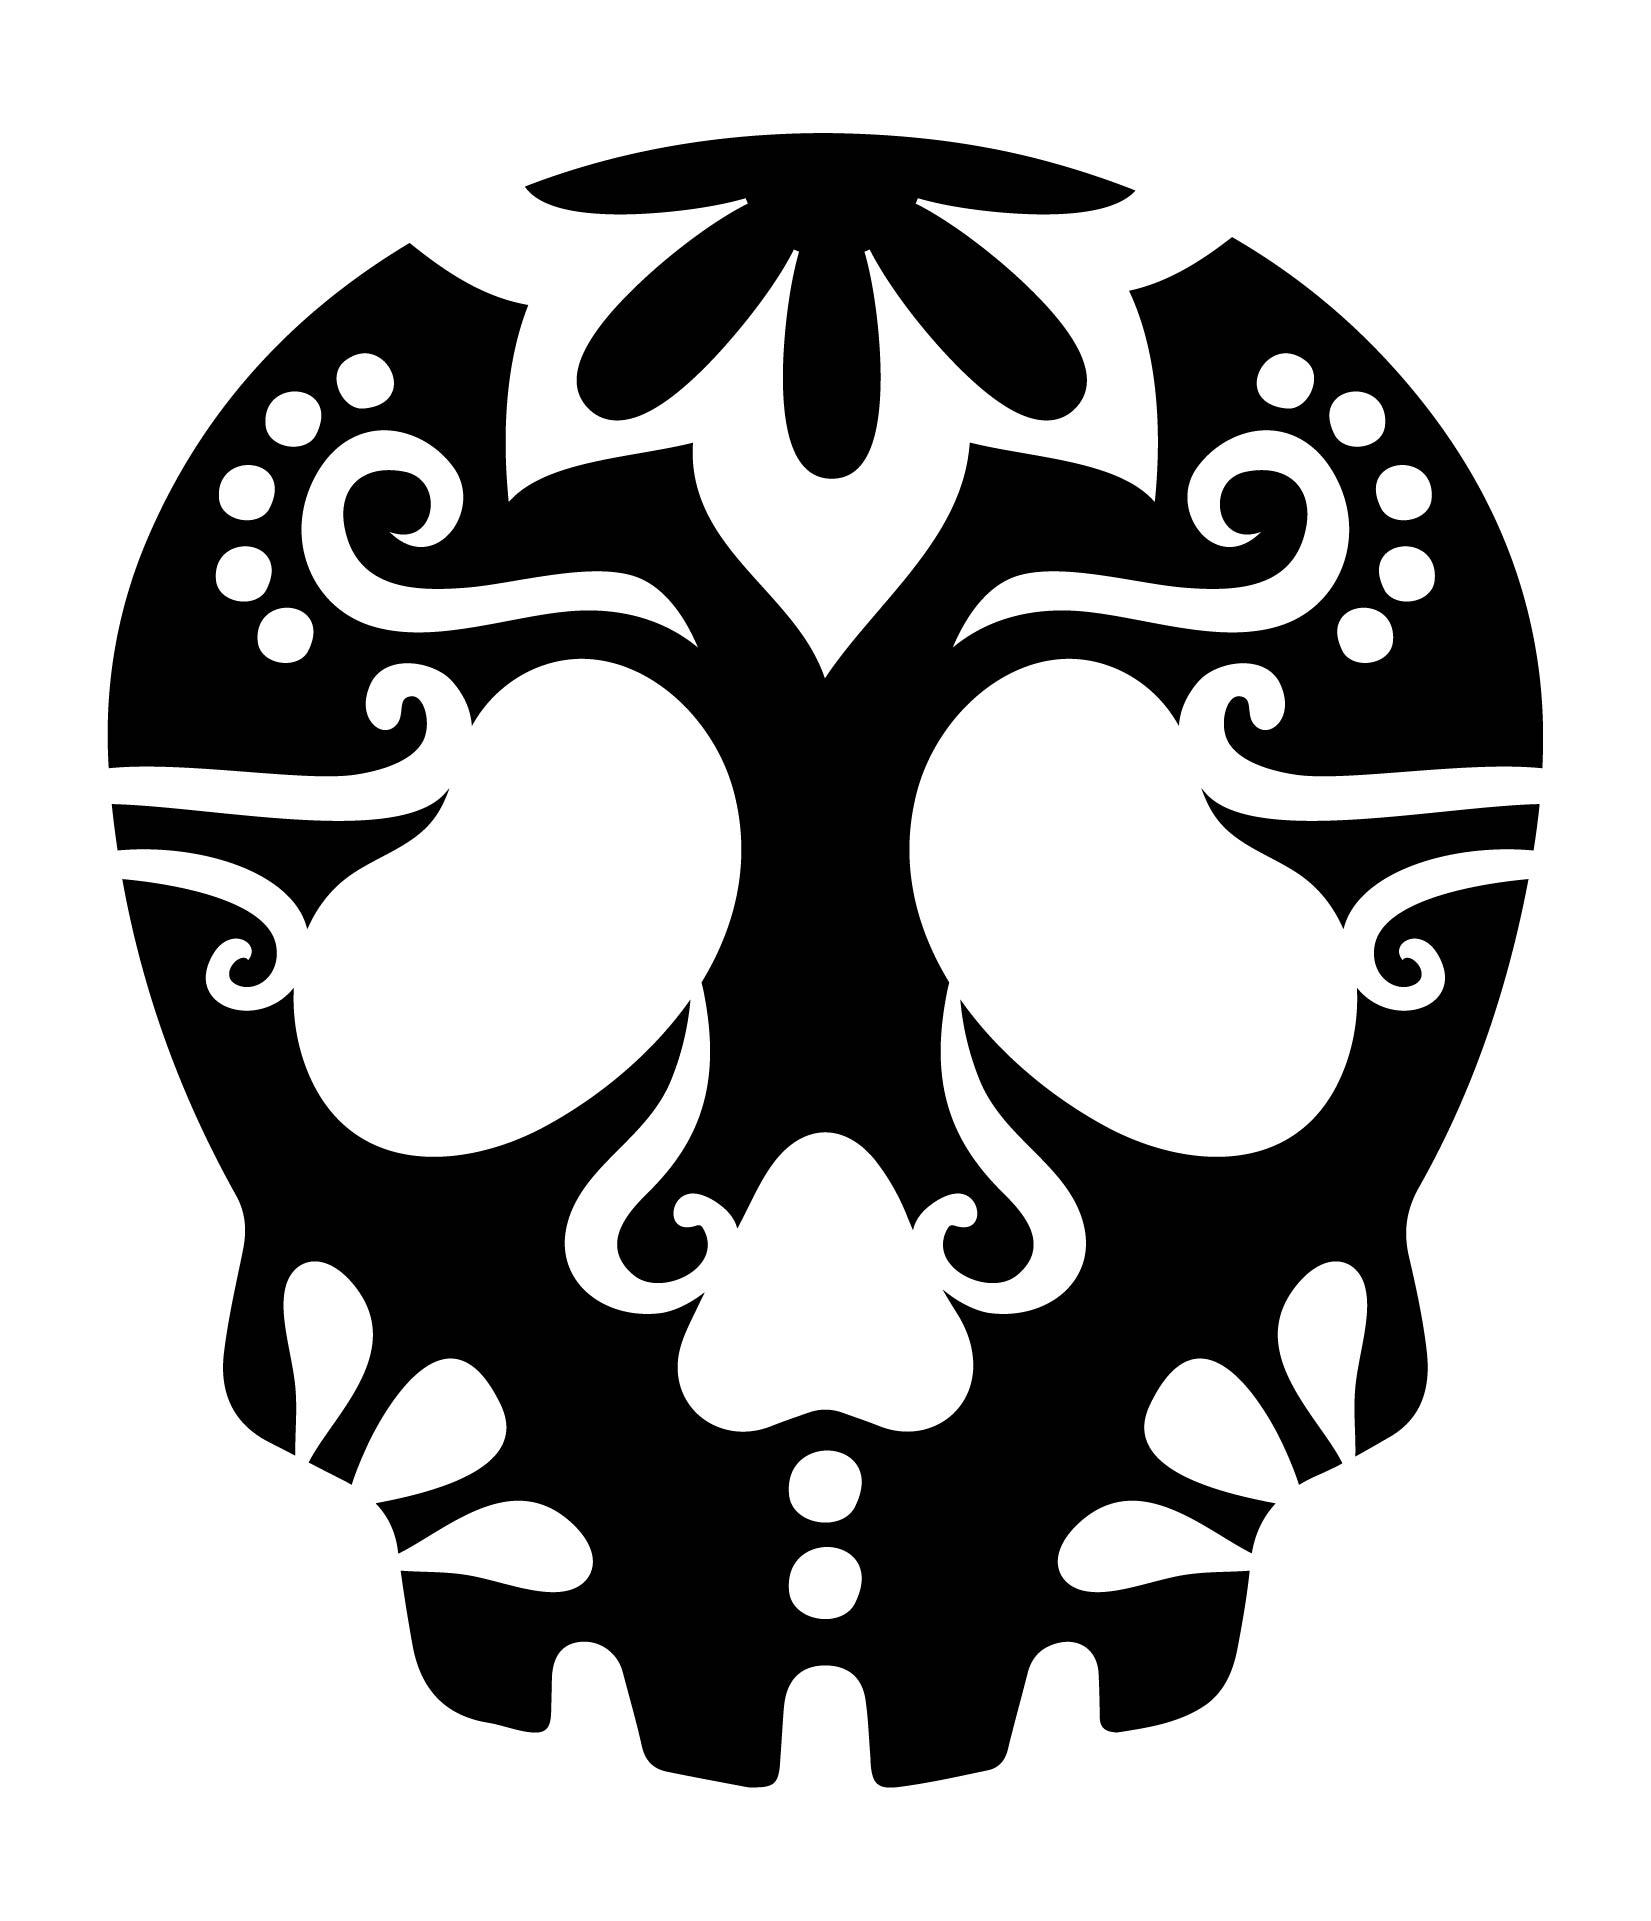 4 Images of Skull Pumpkin Stencils Free Printable